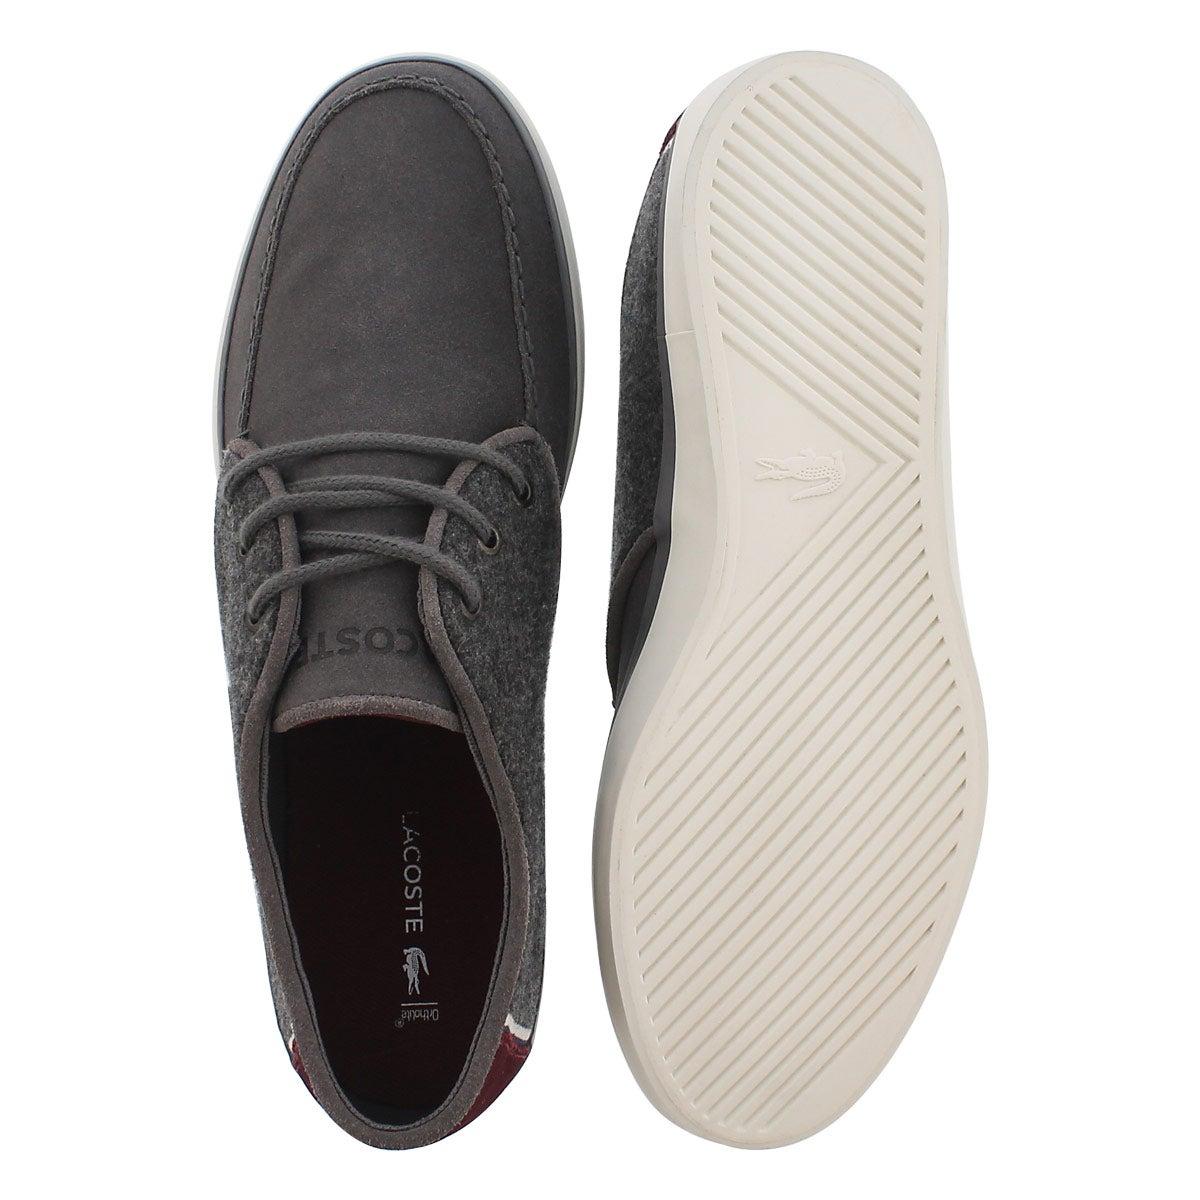 Mns Sevrin 316 3 dk grey casual sneaker